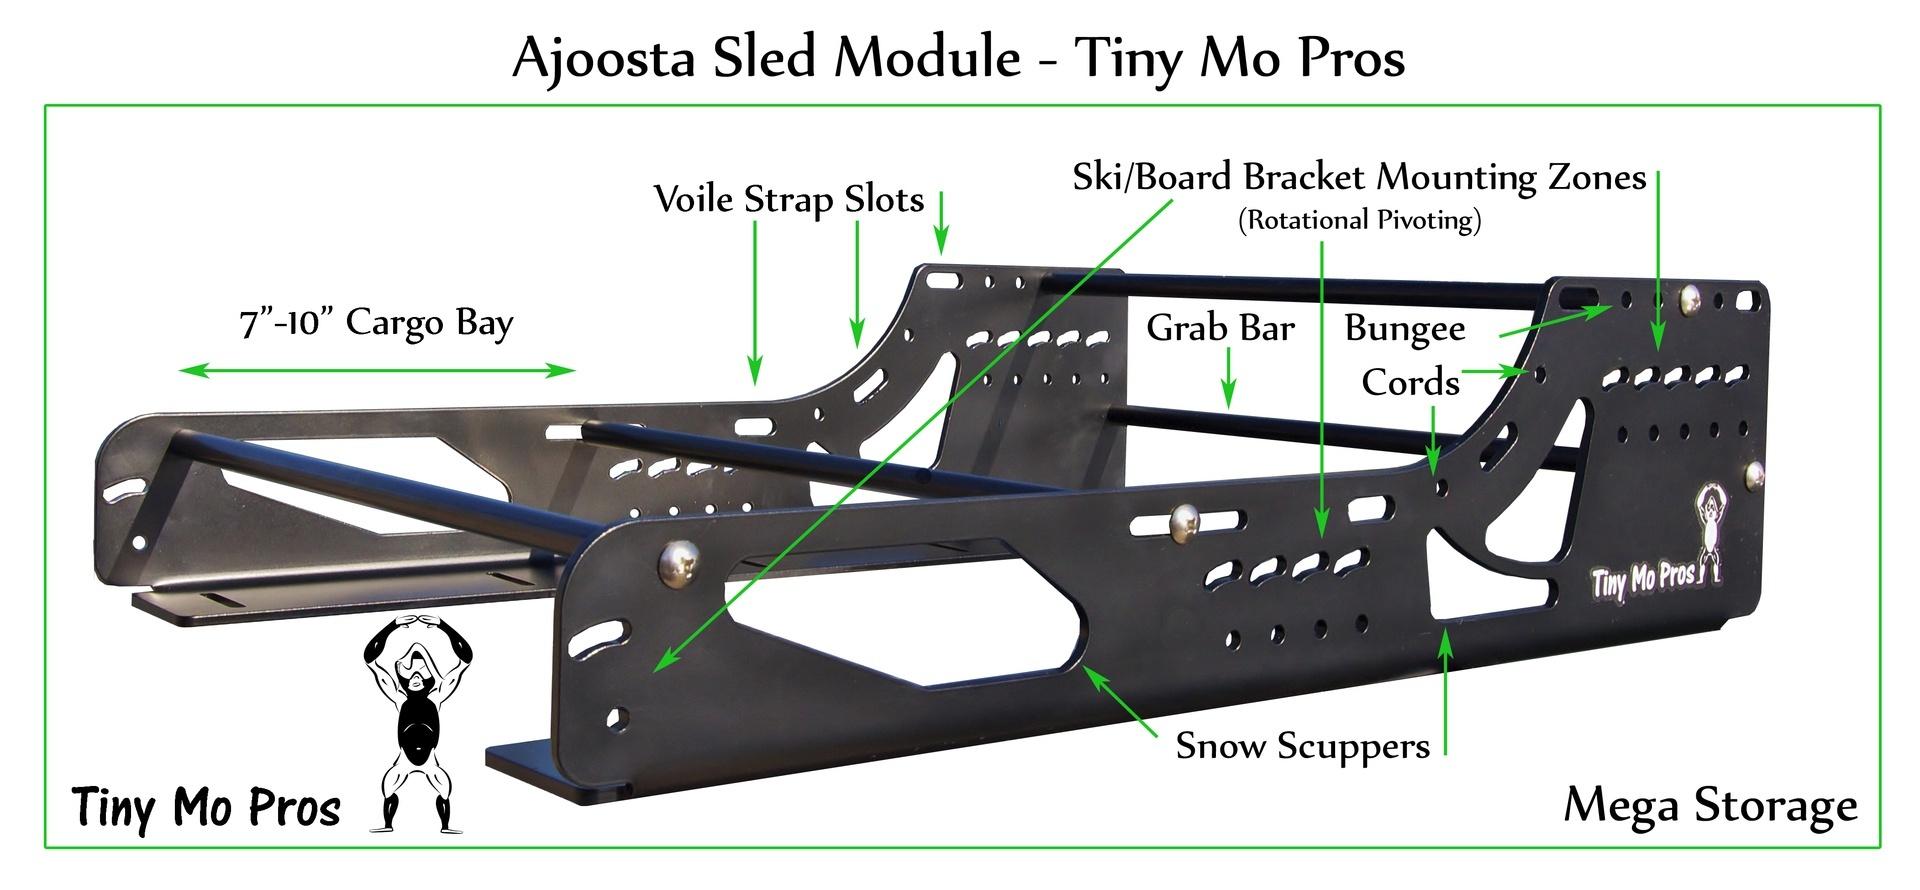 Ajoosta Sled Modules - Tiny Mo Pros